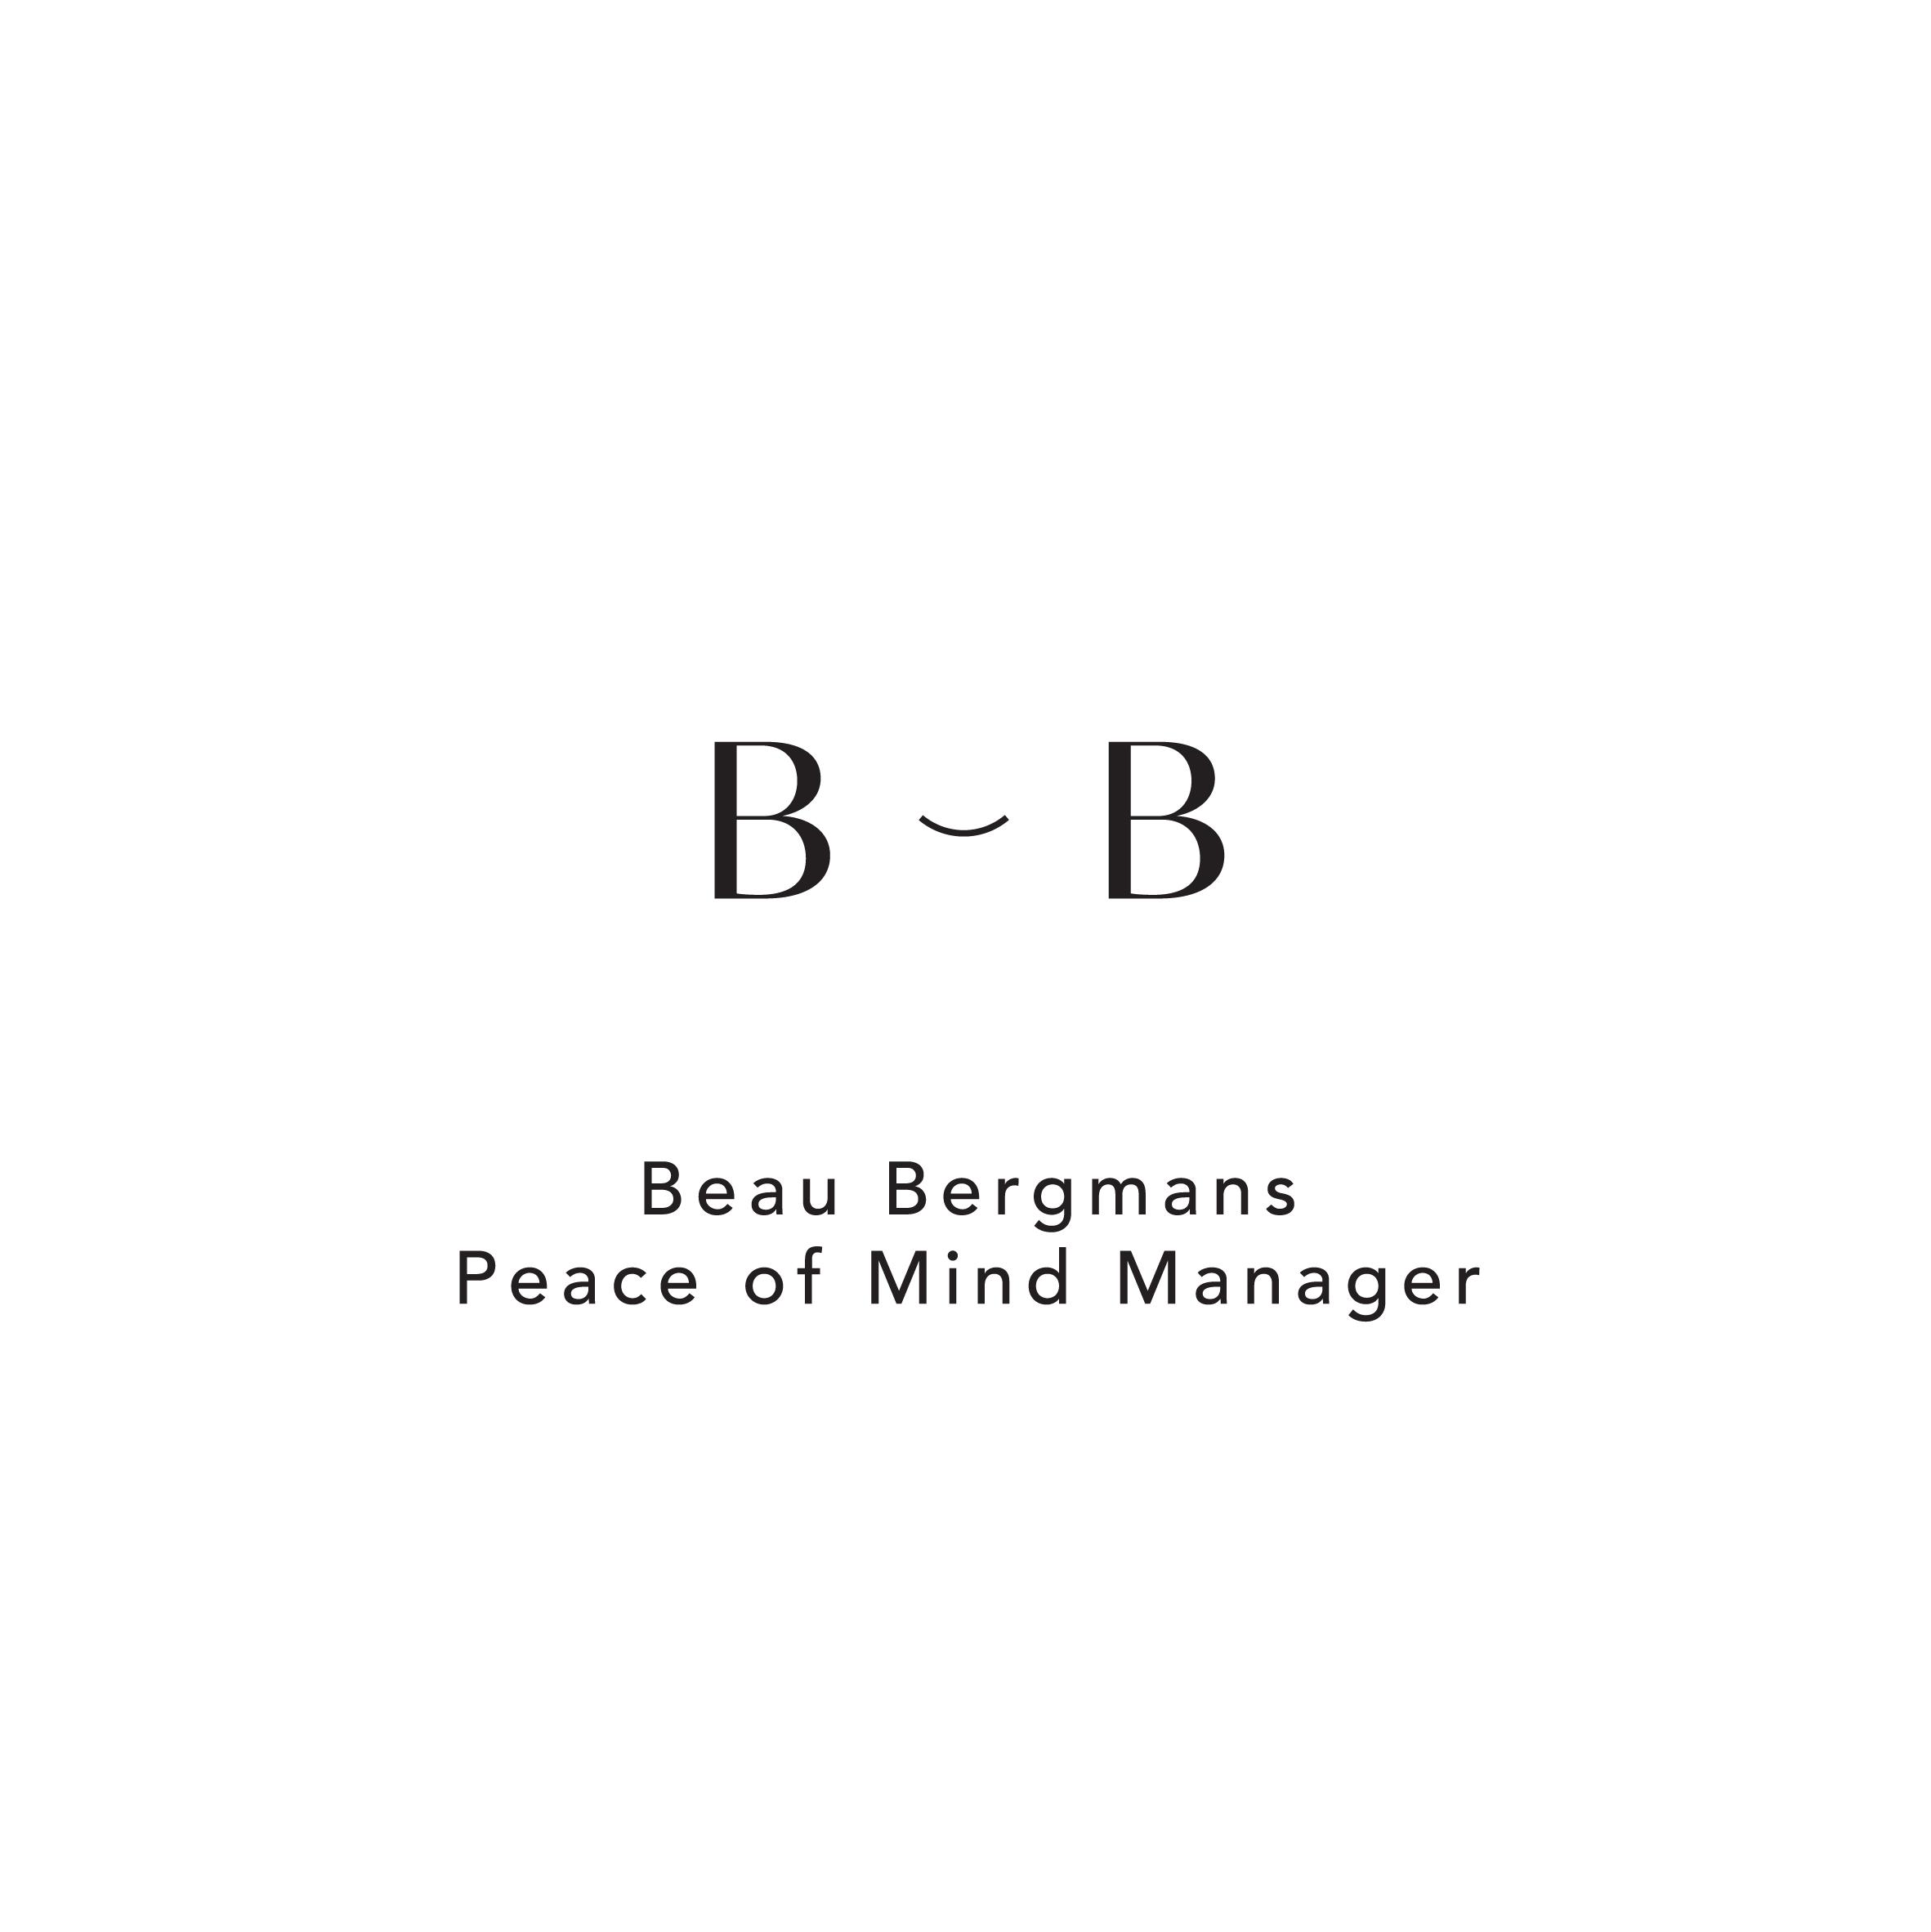 mount-zirkel-grafisch-bureau-beau-bergmans